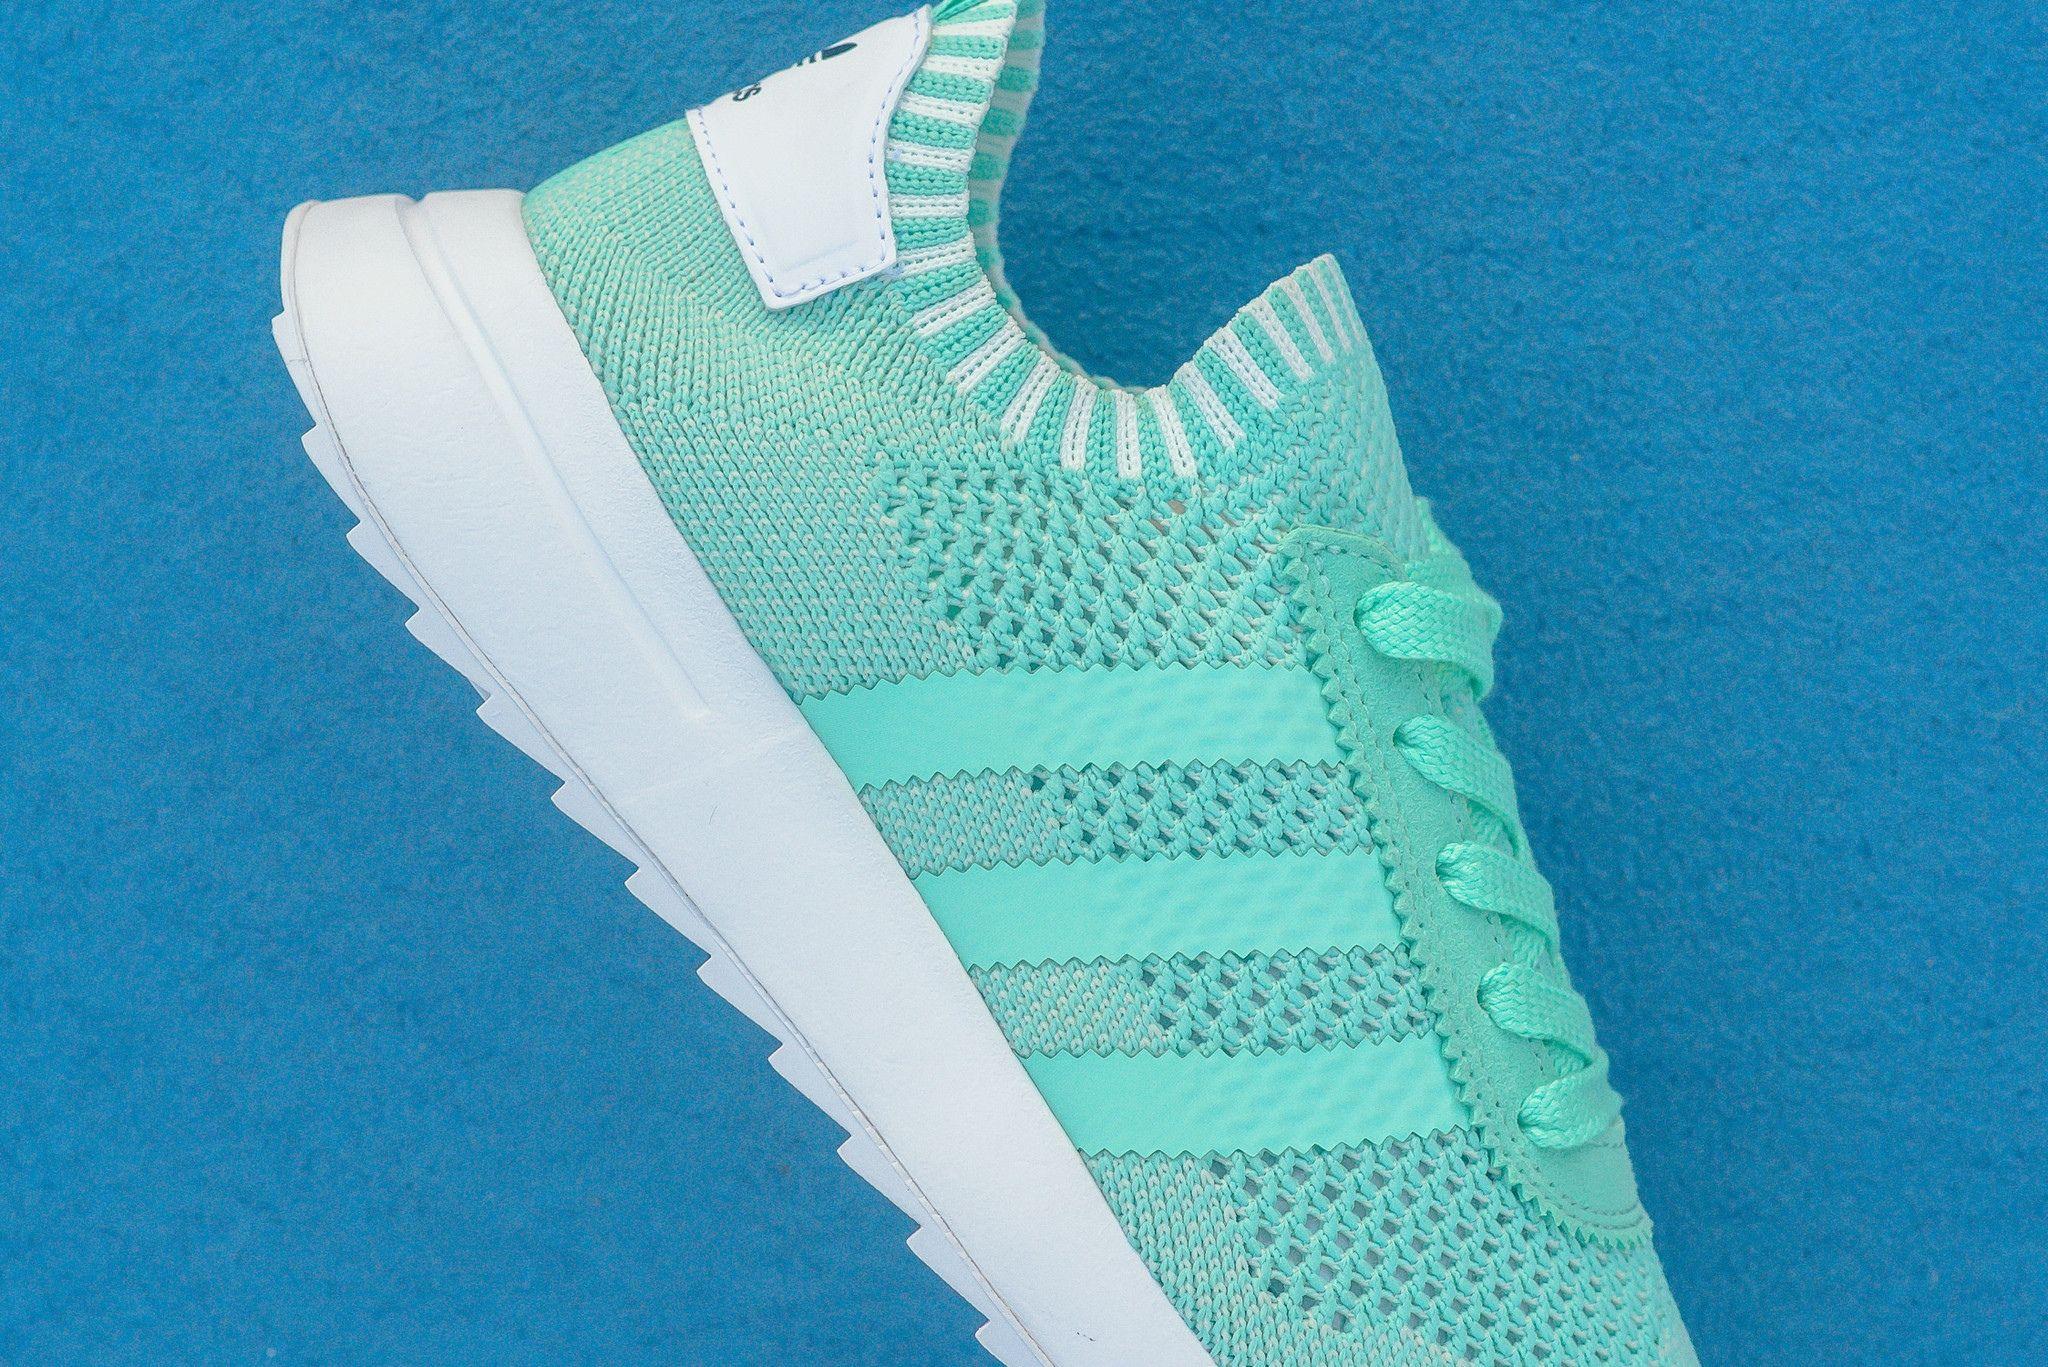 Wmns Adidas Womens Flashback Primeknit Pk Sneaker Politics Hyebeast 3